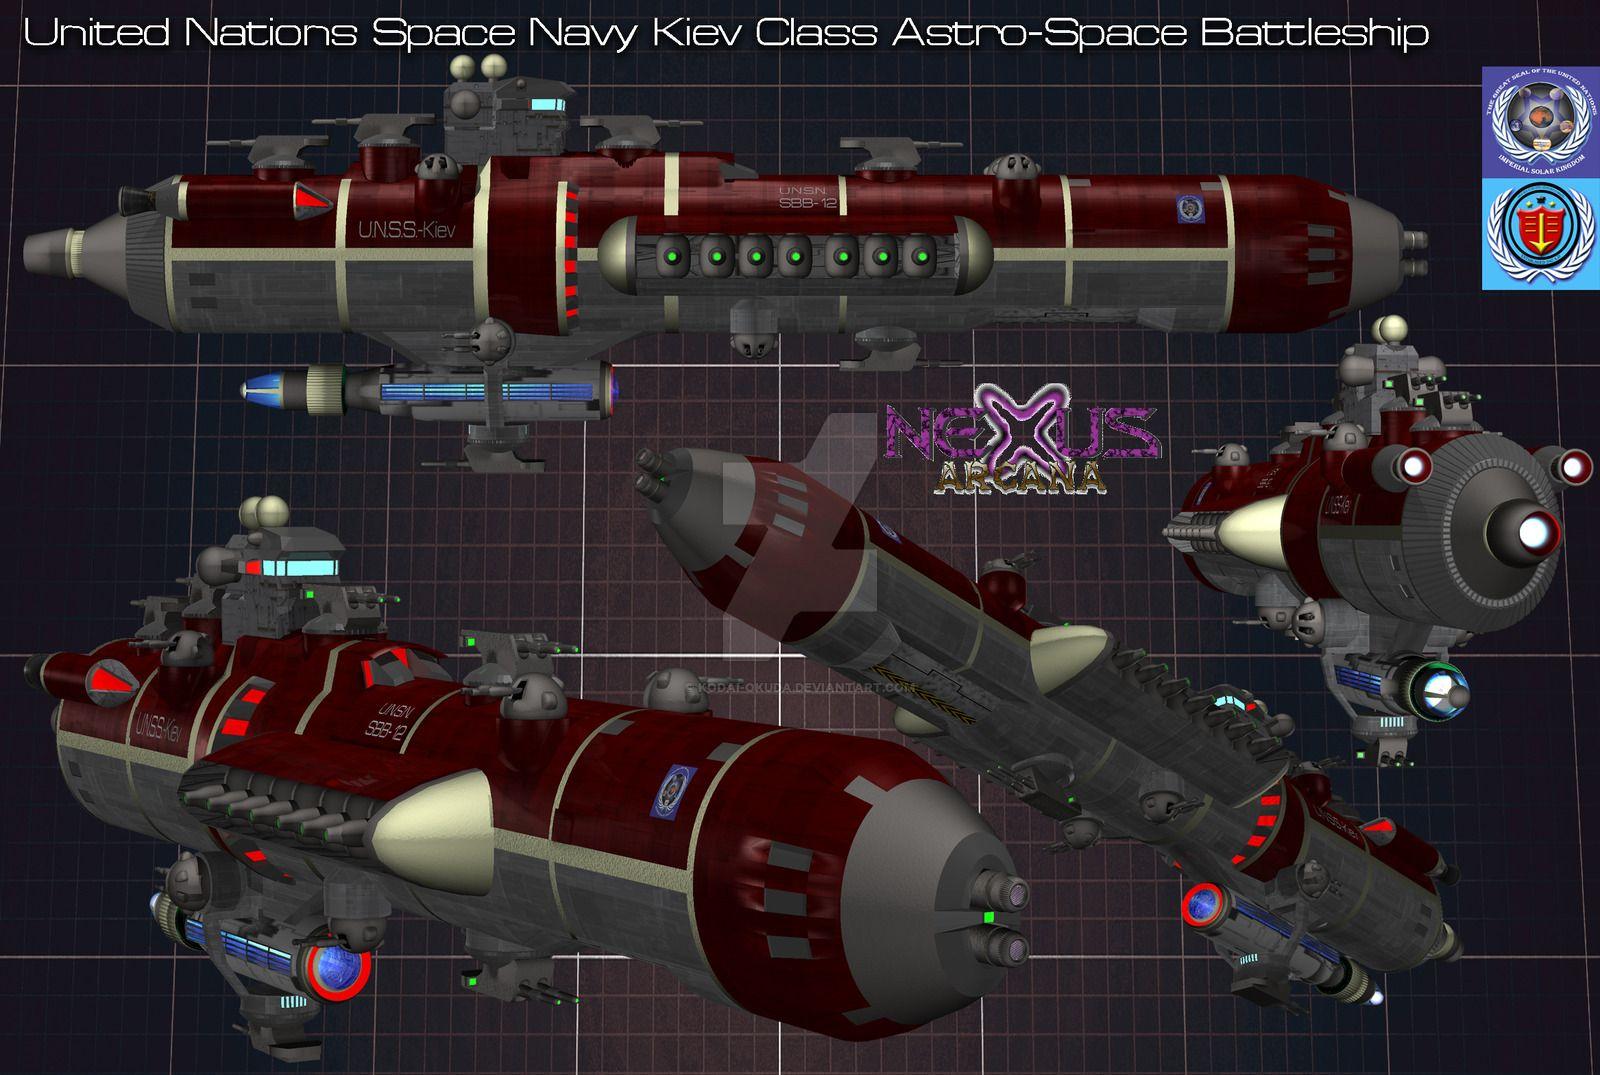 Kiev class battleship by kodaiokuda on deviantart with